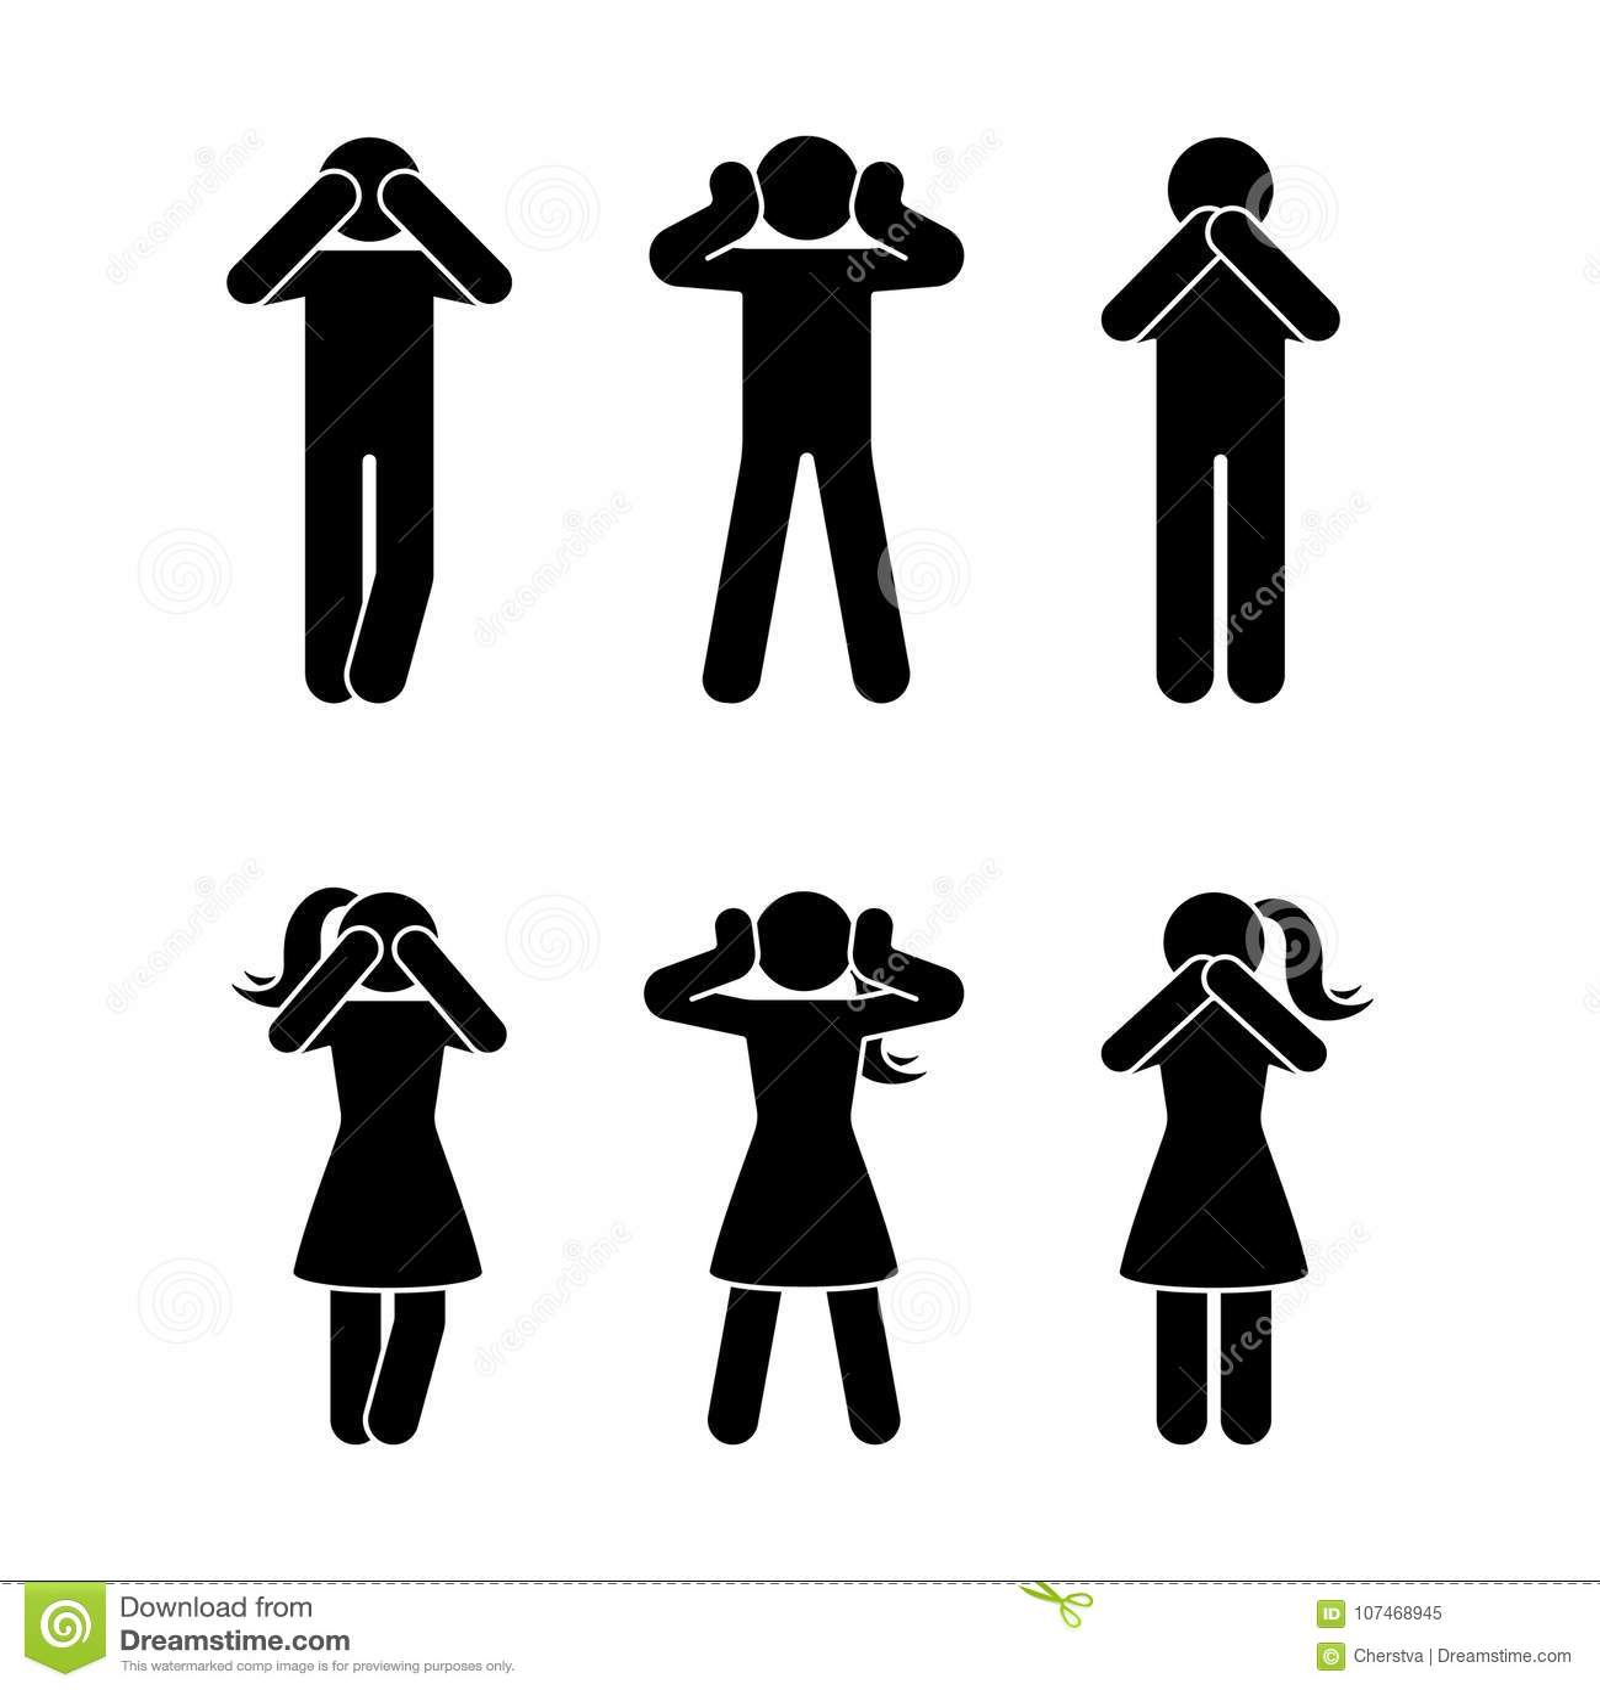 Stick figure set of three wise monkeys pictogram see no evil hear no evil